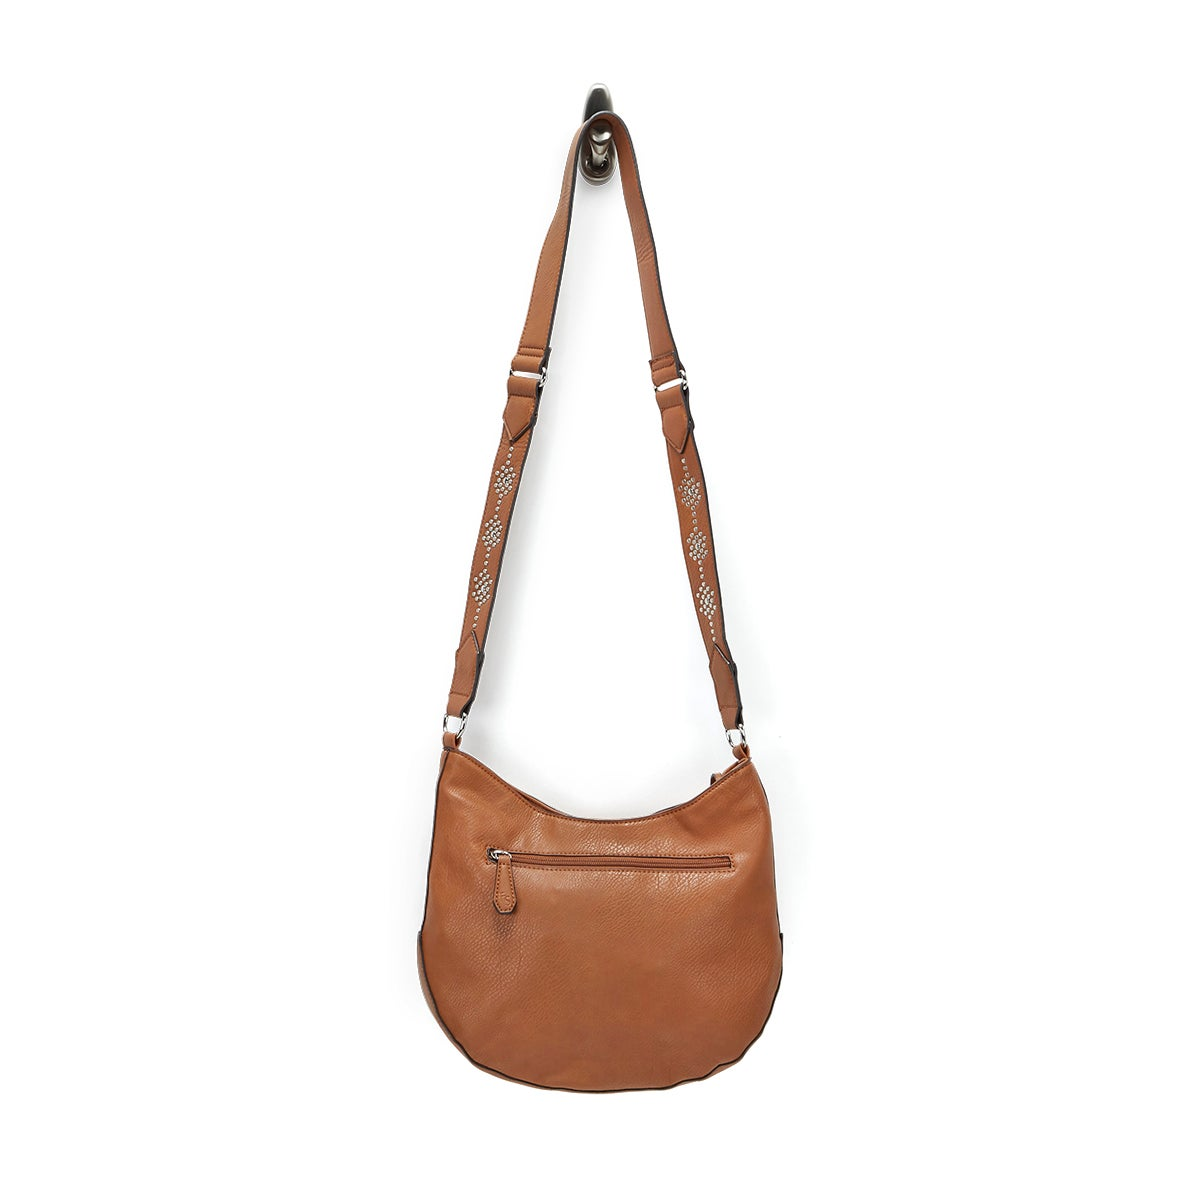 Lds Eva luggage cross body bag